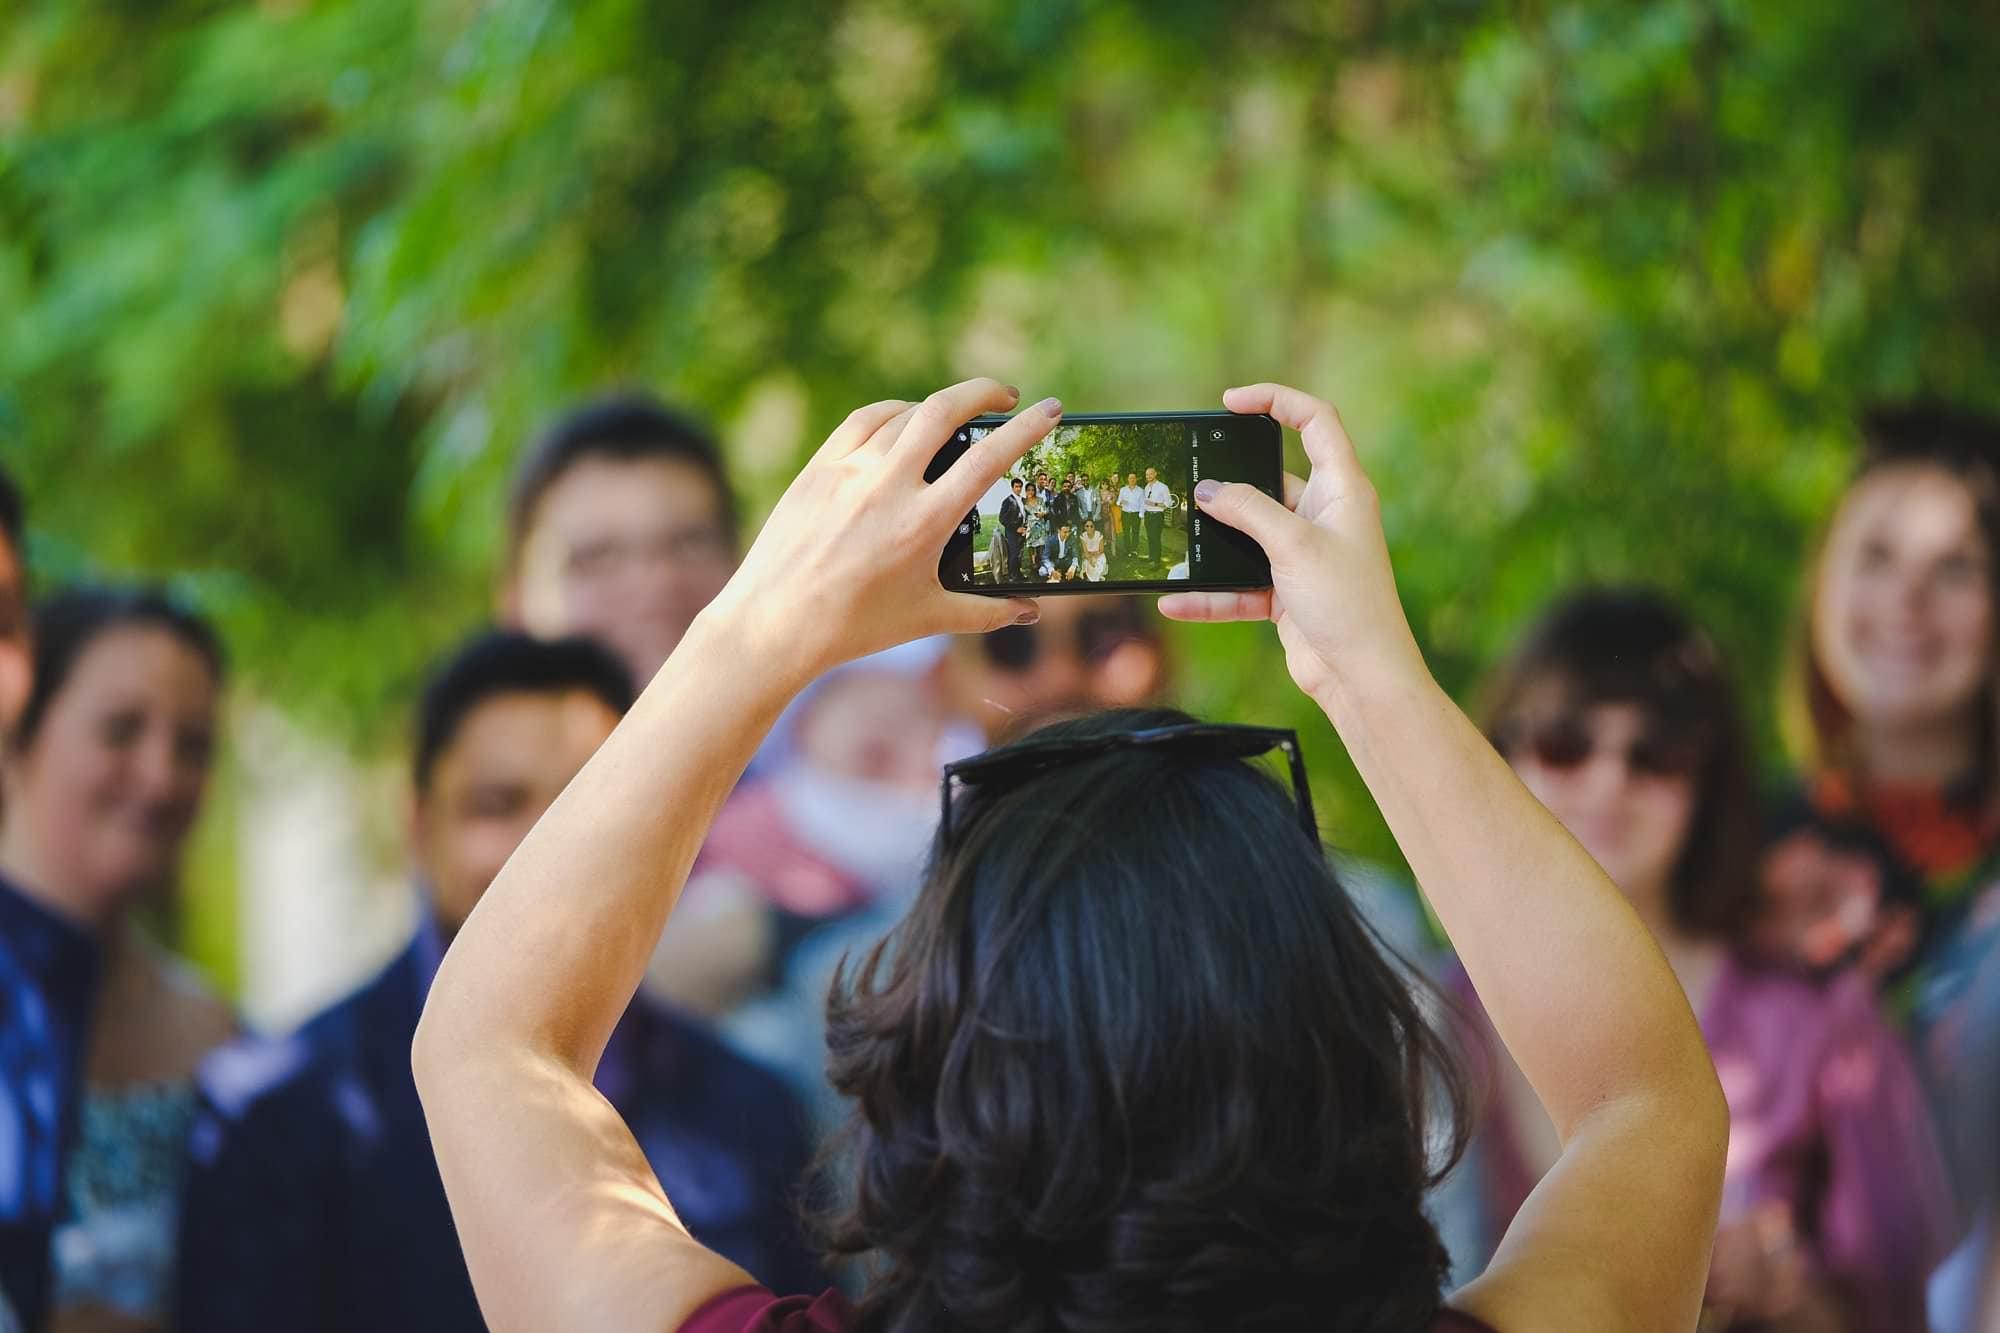 orangery holland park wedding reception 005 - Holland Park Orangery Wedding Photographer | Ayesha & Ritam